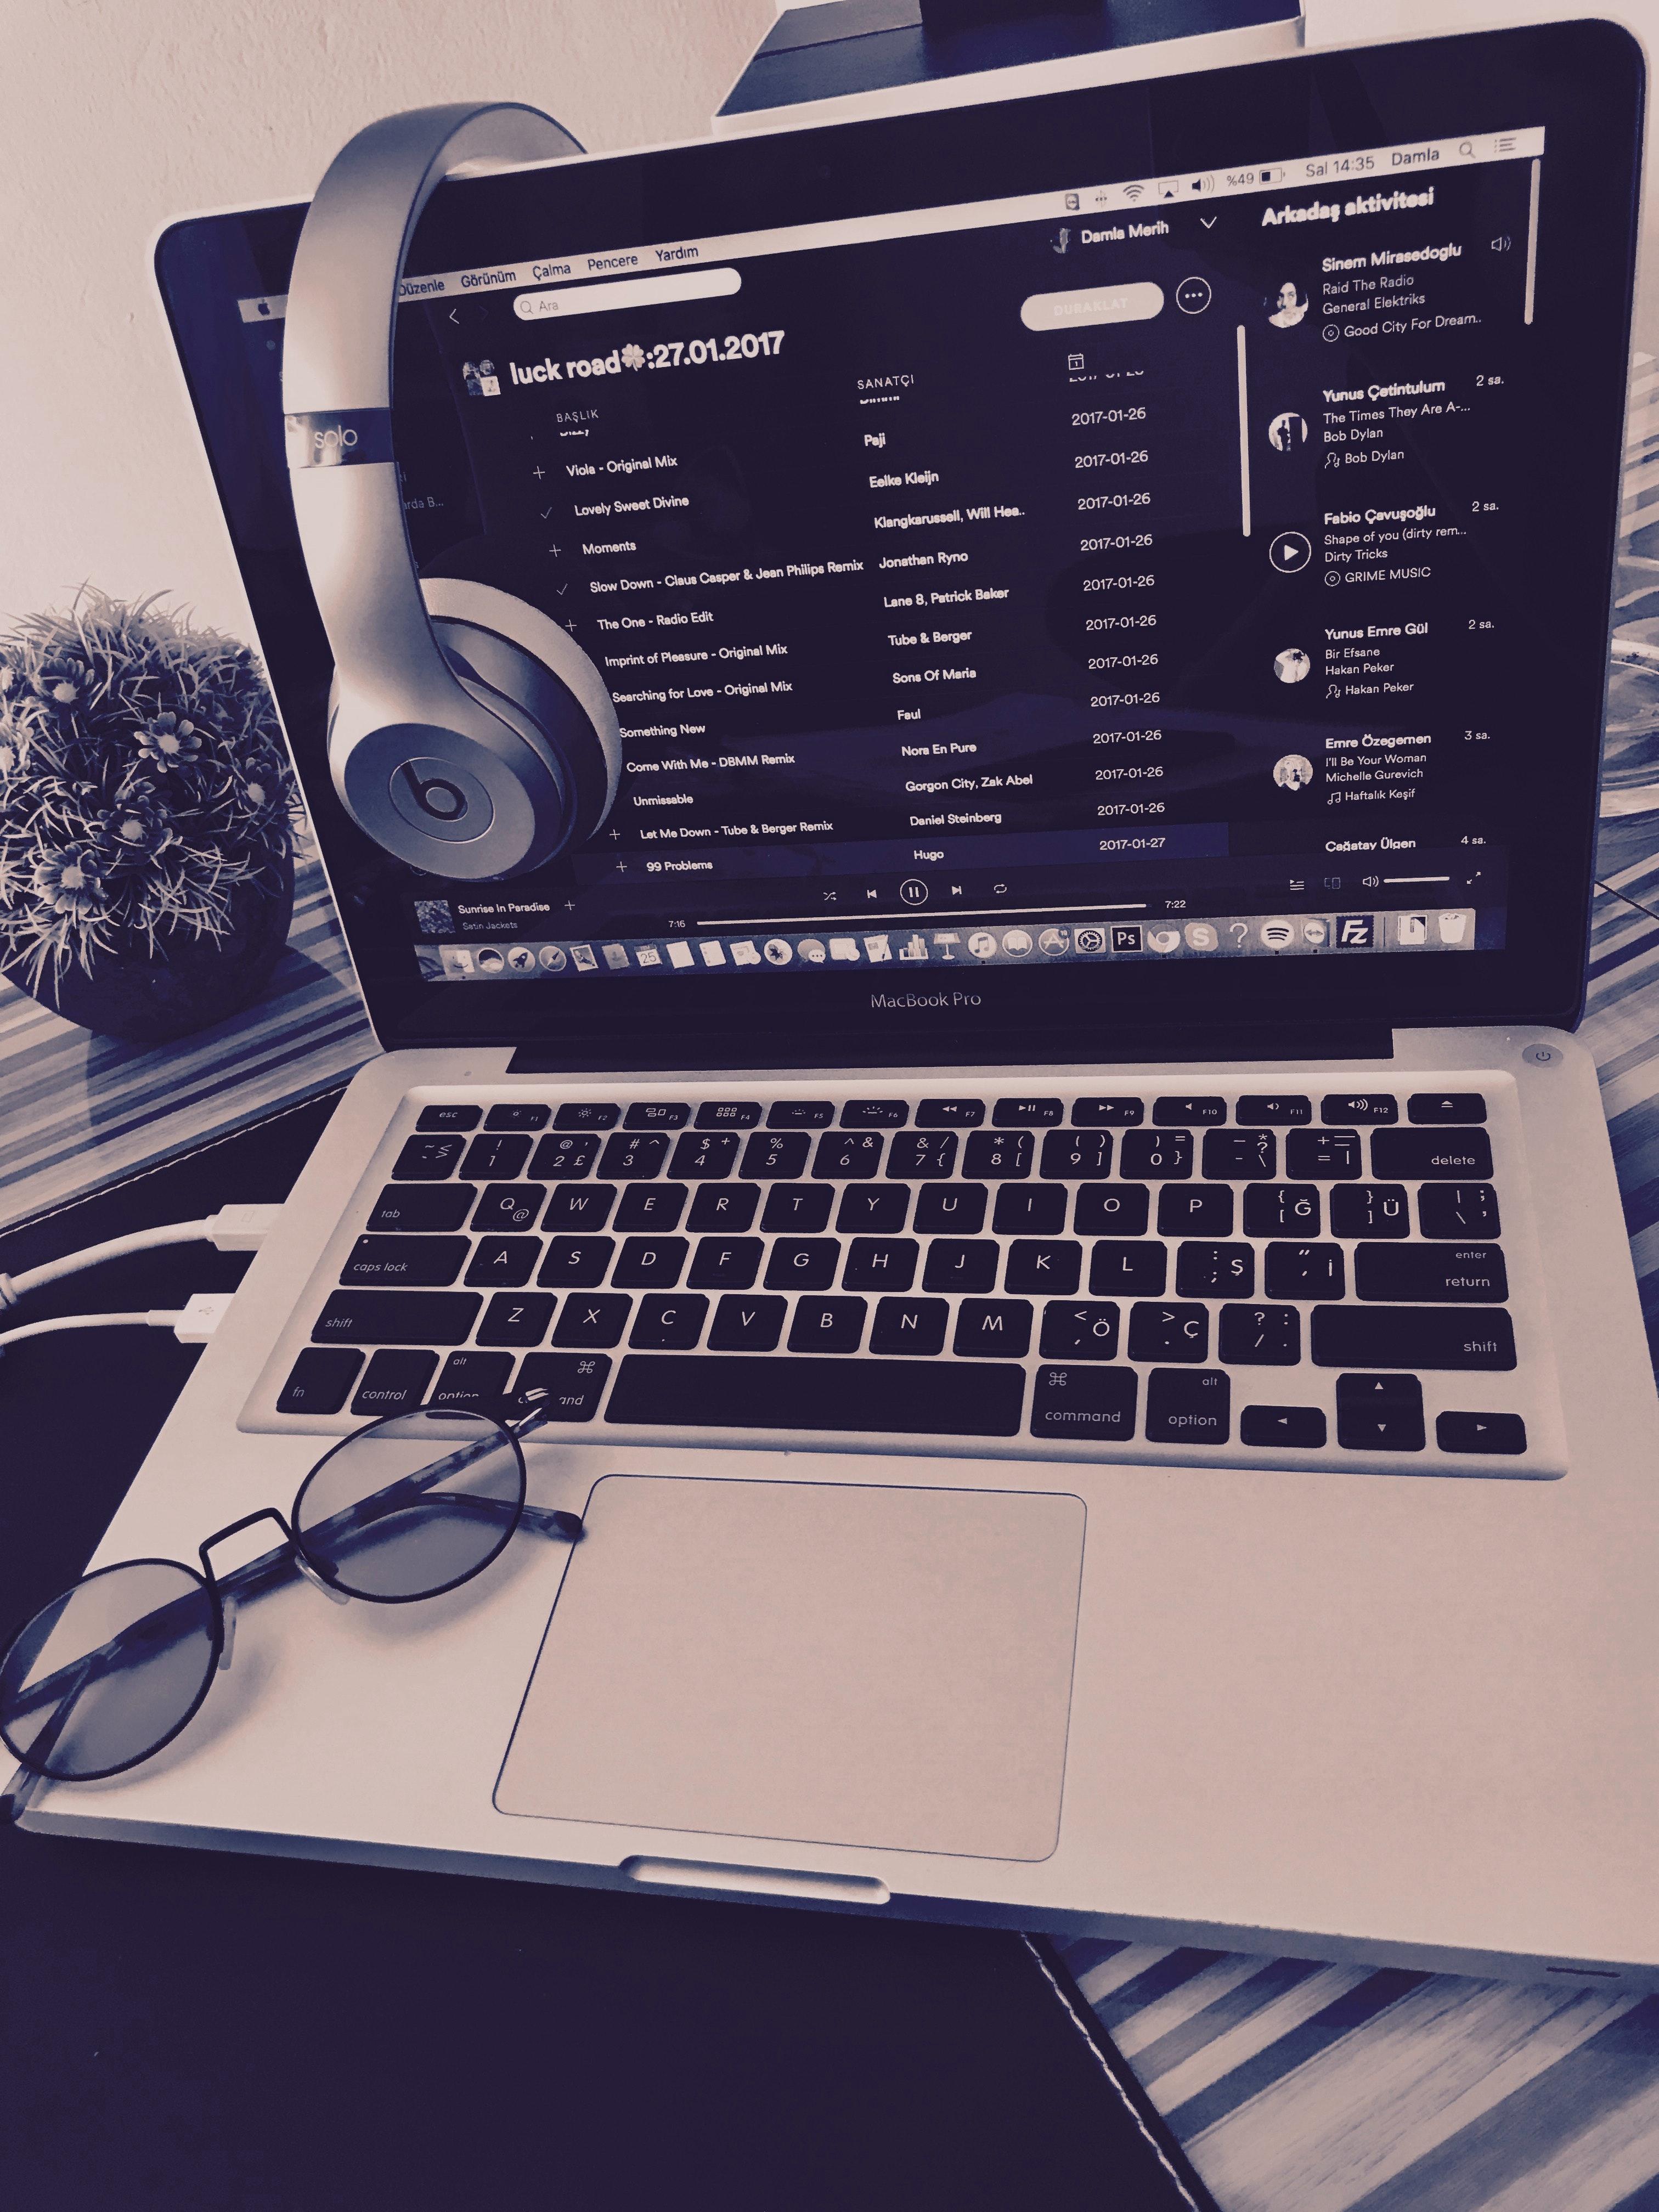 Free stock photo of Beatsolo3, live music, macbook pro